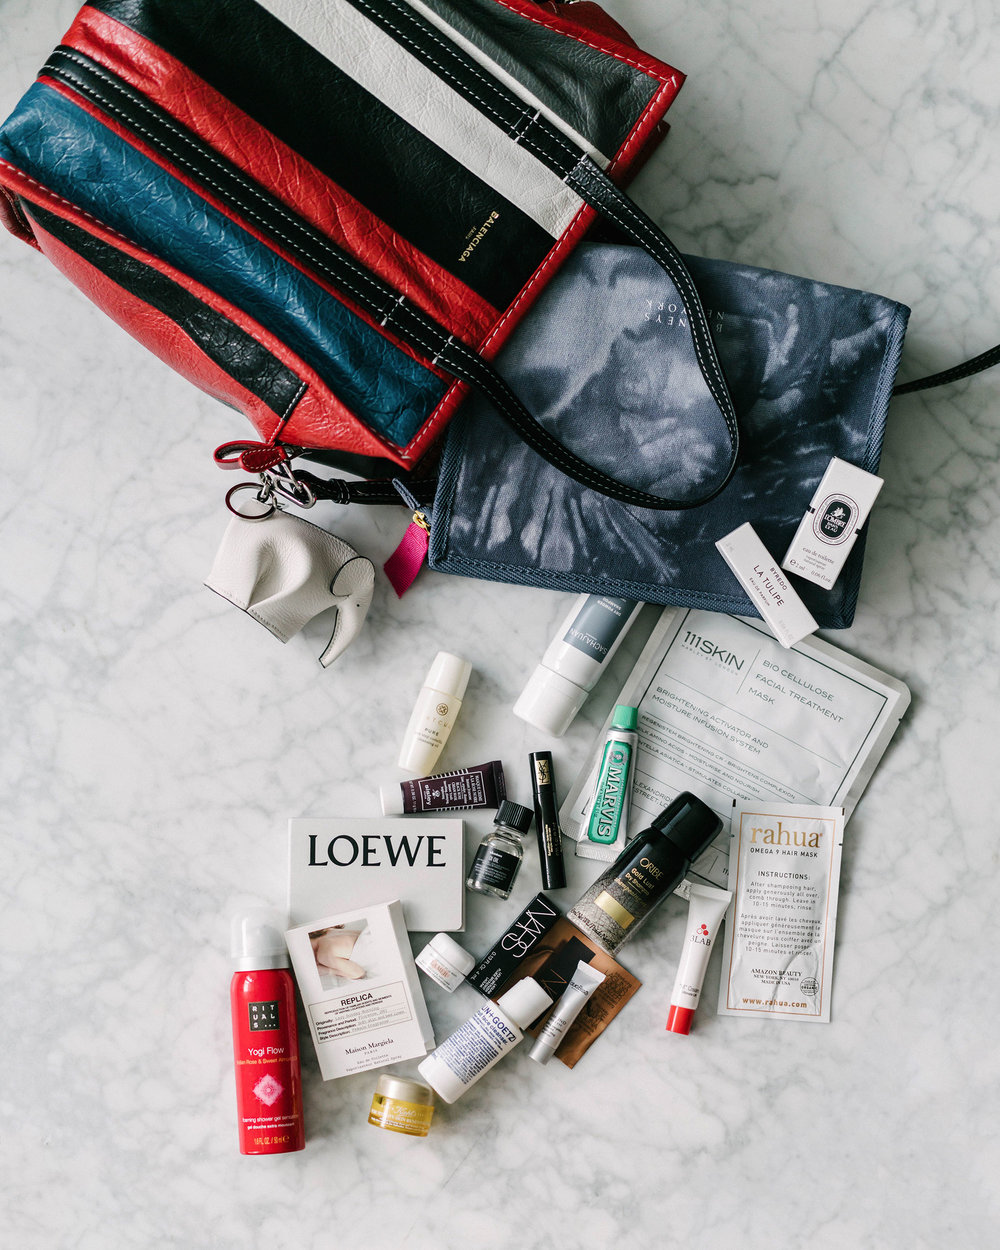 Balenciaga Bag , Loewe Keychain,  Barneys New York Love Yourself Beauty Bag  (ends tomorrow, March 11th!)